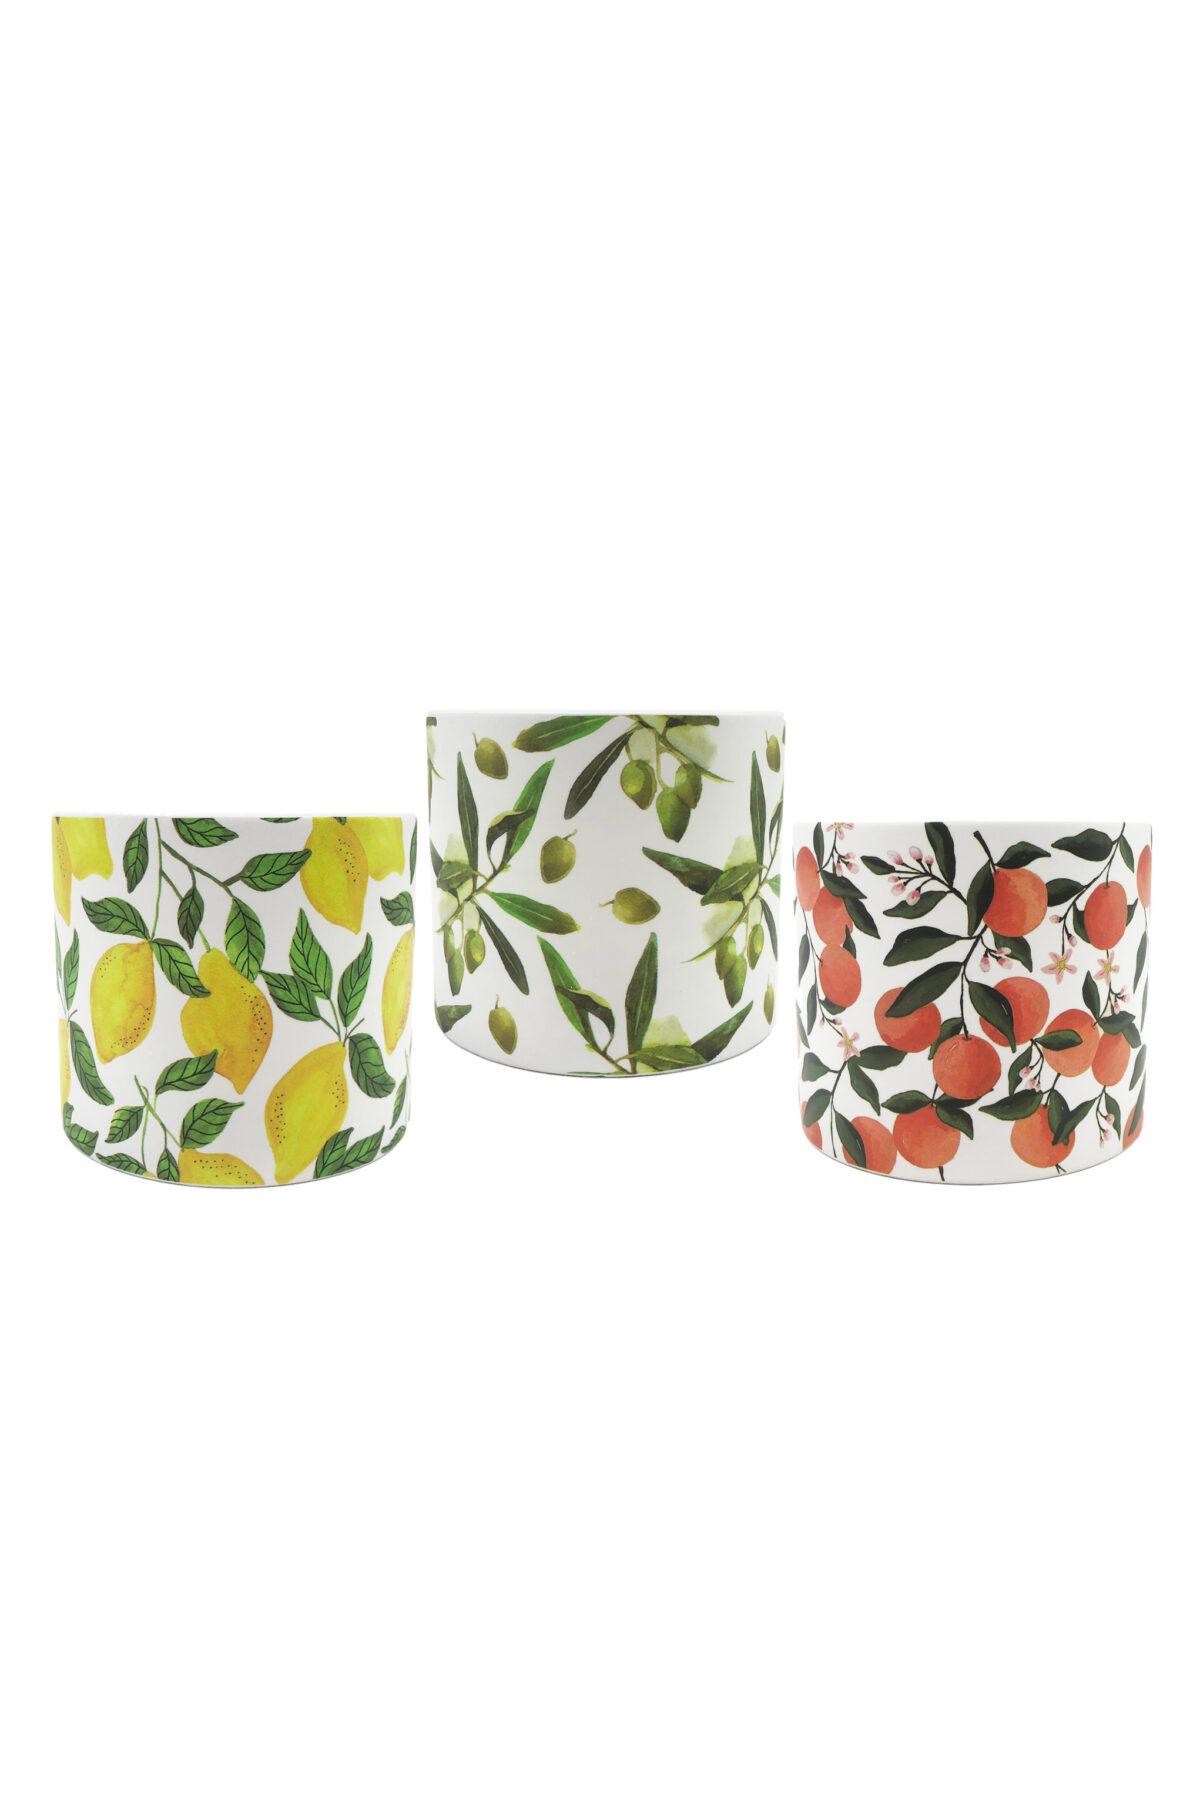 Set 3 Vasi caspò portapiante in ceramica bianca Mix design con limoni, arance e olive d.13,8 h. 12,5 cm